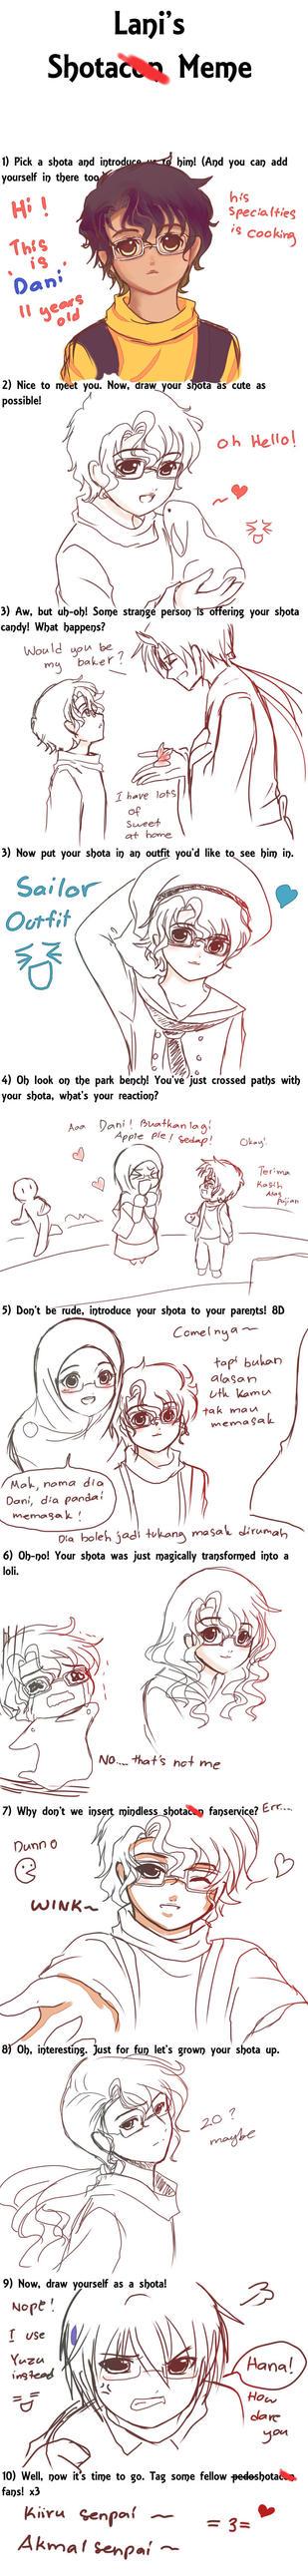 Dani Shota(con?) Meme by yuzuhana